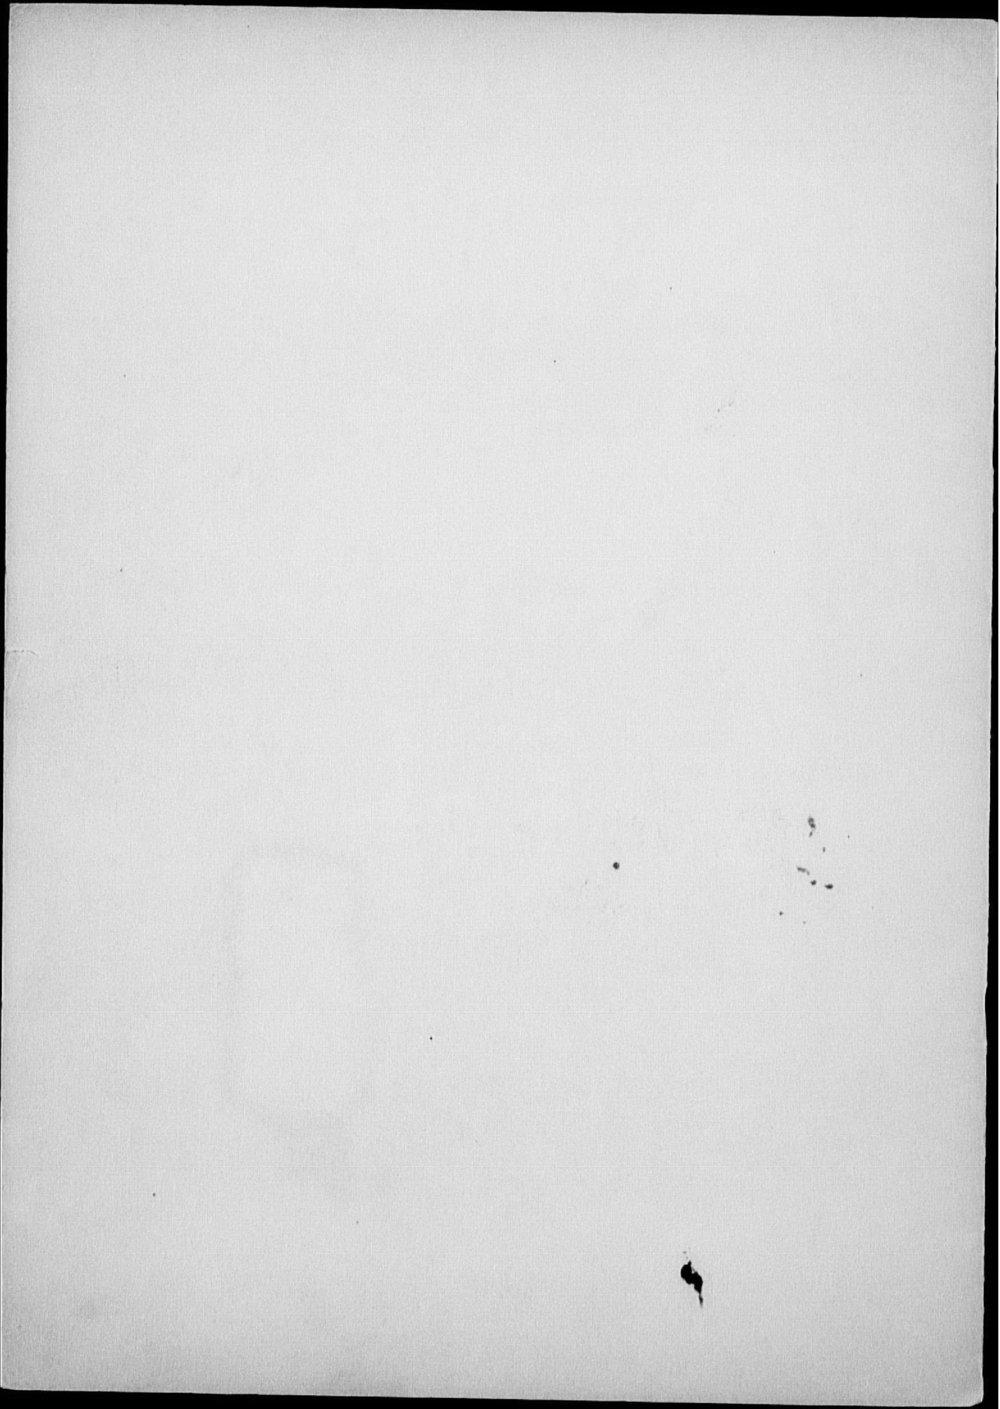 The Kansas Star, volume 51, number 11 - Blank